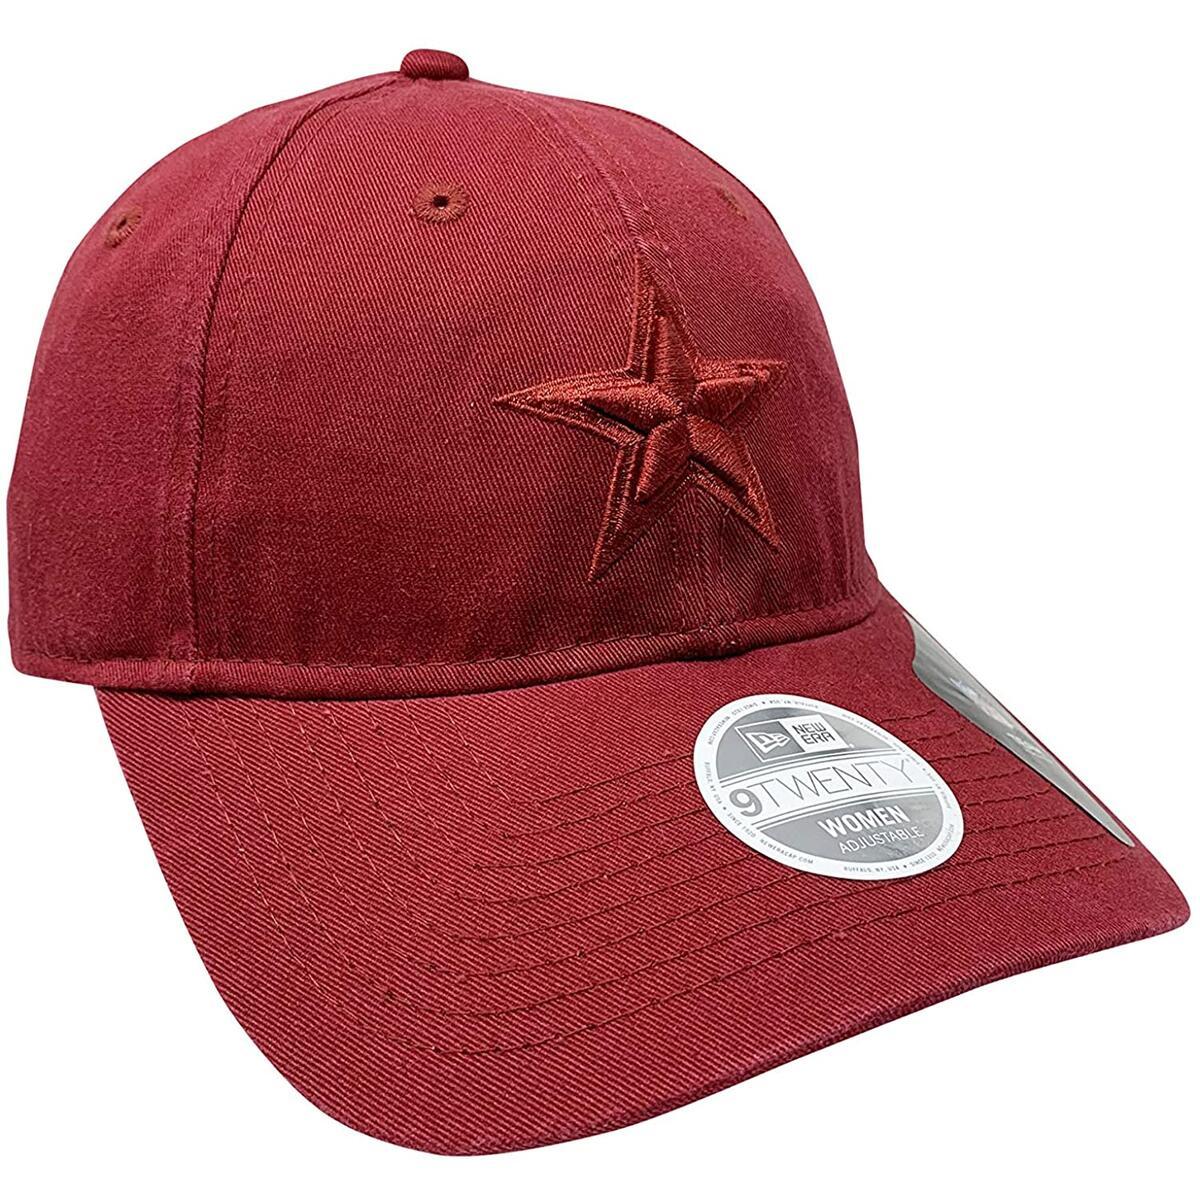 New Era 9Twenty Hat Women's Dallas Cowboys NFL Adjustable Cap (One Size, Red)